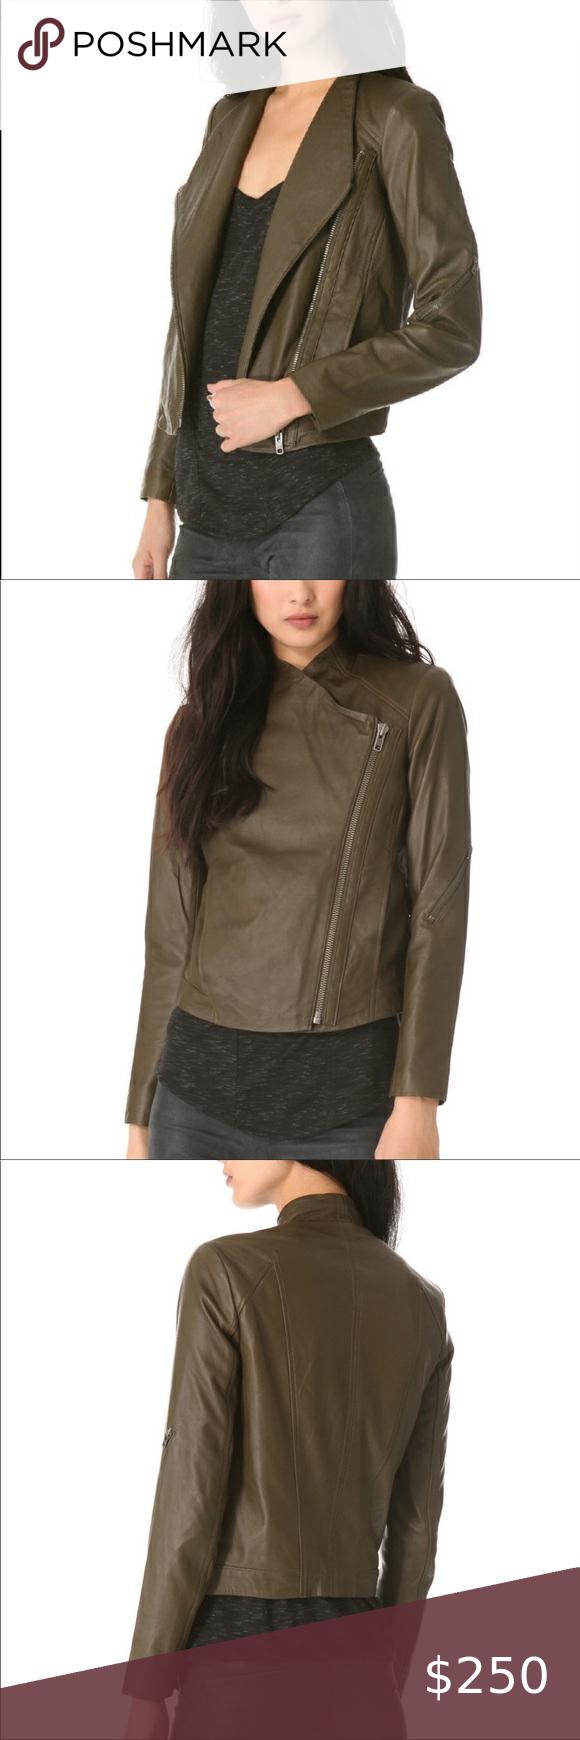 Olive Green Helmut Lang Leather Jacket Large In 2020 Olive Green Leather Jacket Leather Jacket Green Leather Jackets [ 1740 x 580 Pixel ]